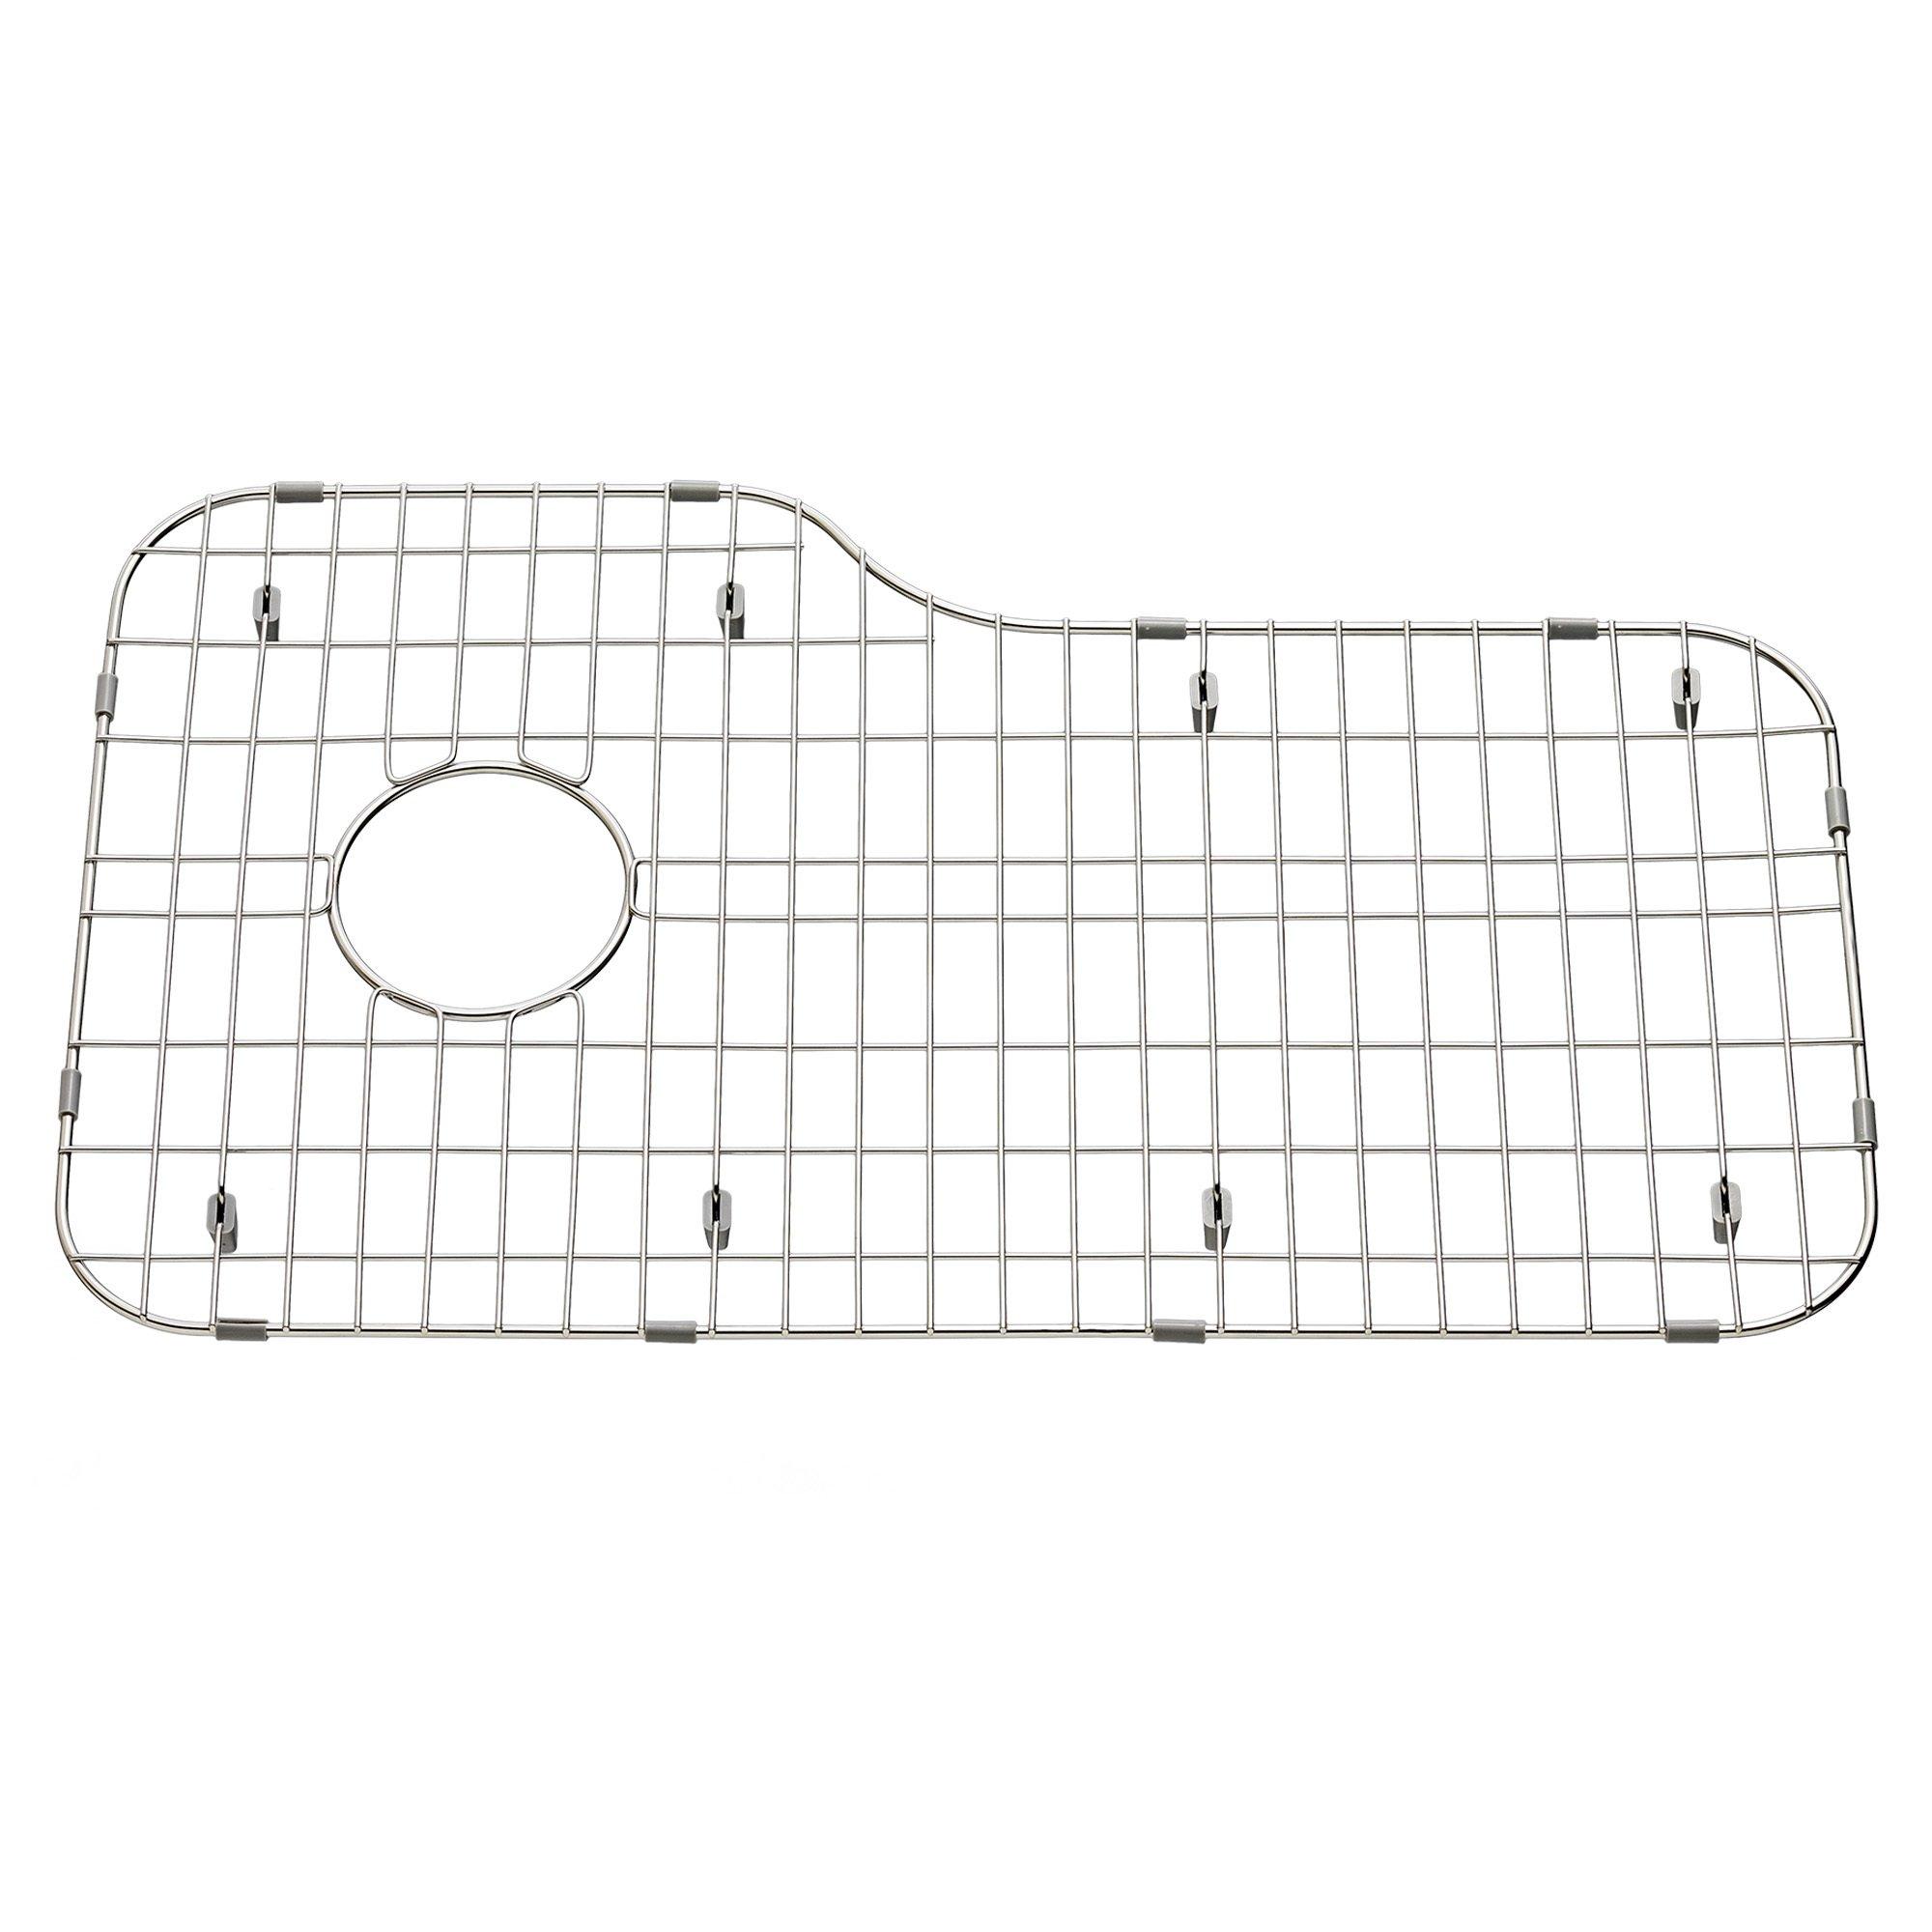 American Standard 7435000.075 26.77-in x 15.85-in Sink Grid, Stainless steel by American Standard (Image #1)